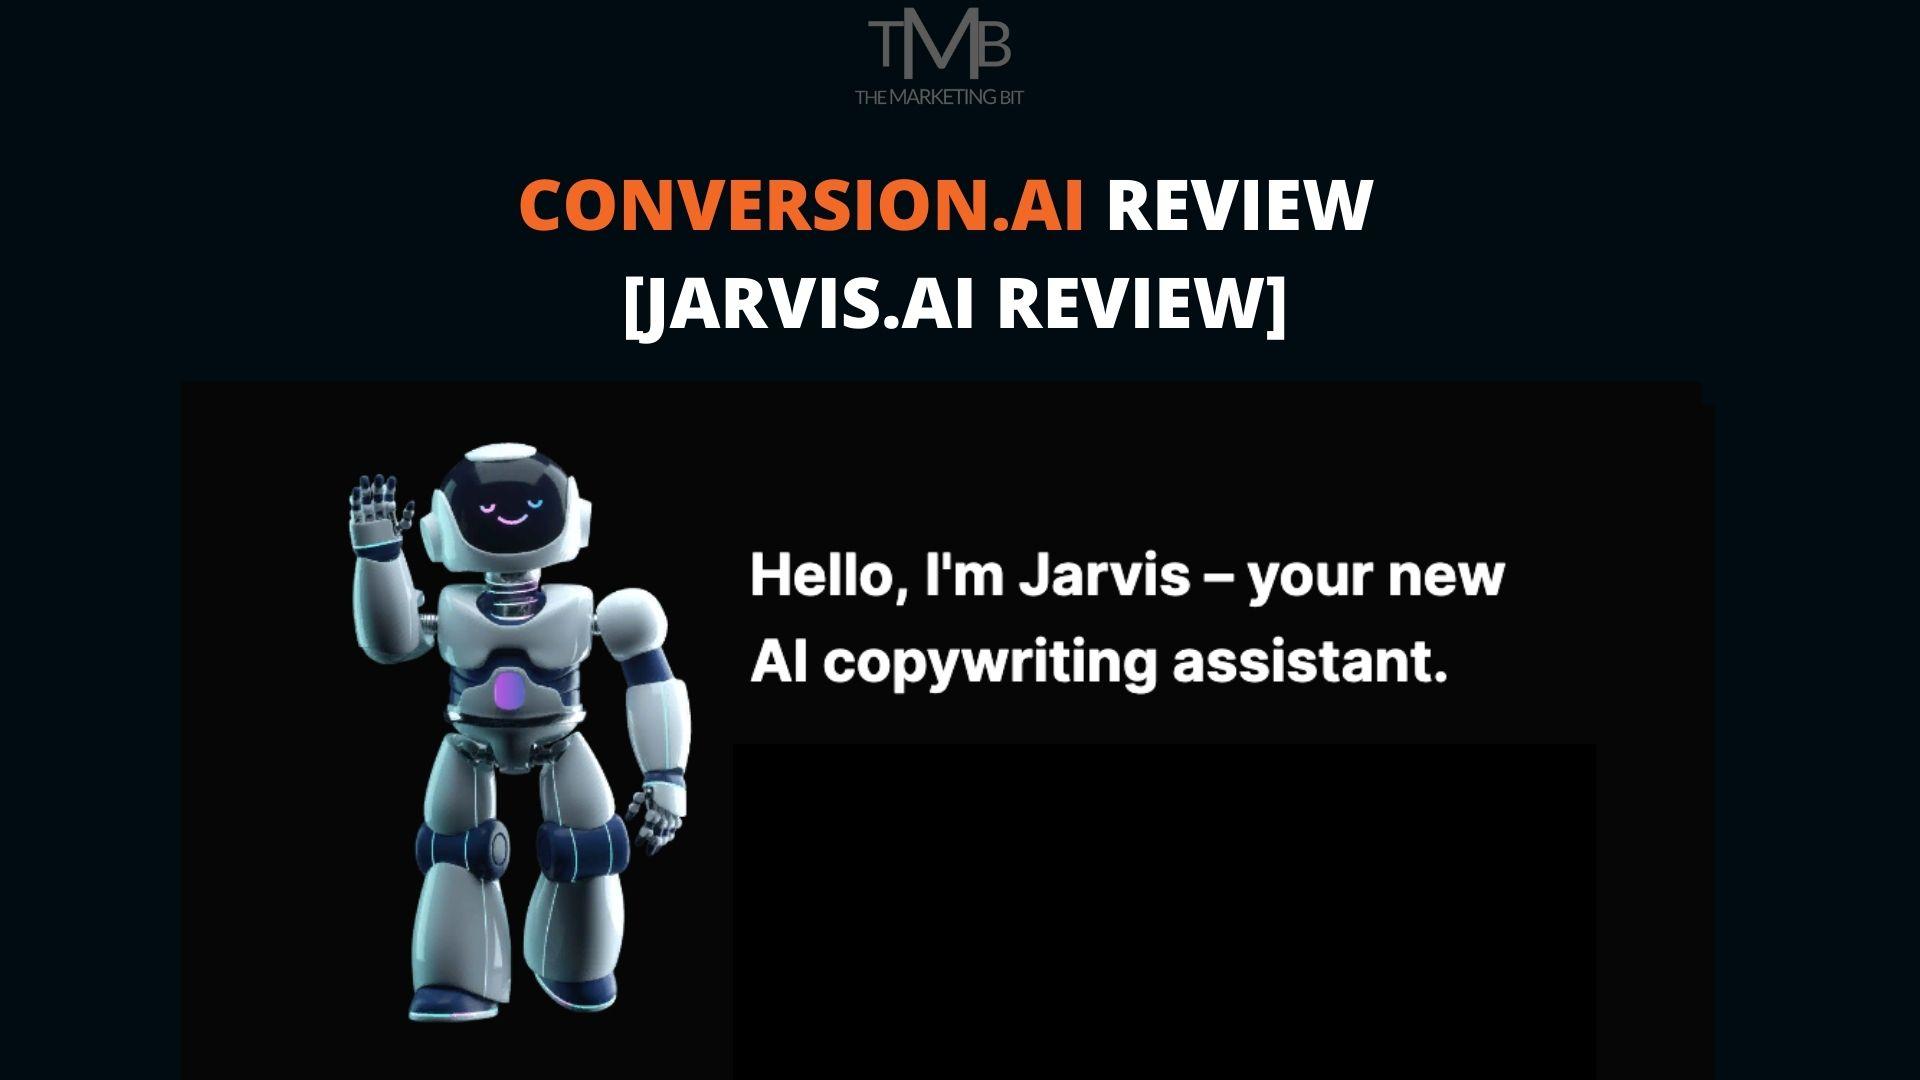 conversion.ai review